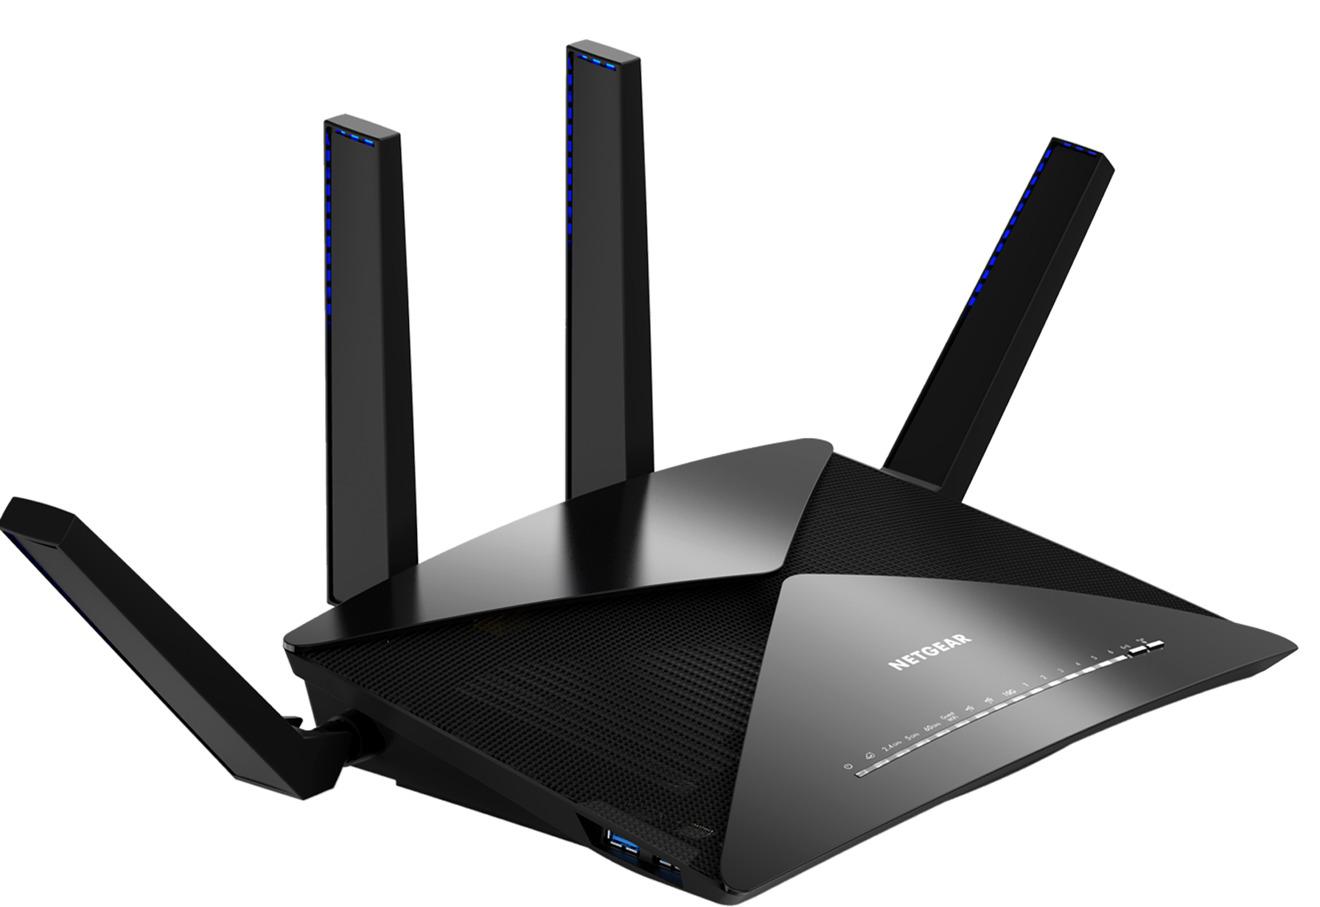 Netgear Nighthawk AD7200 Router